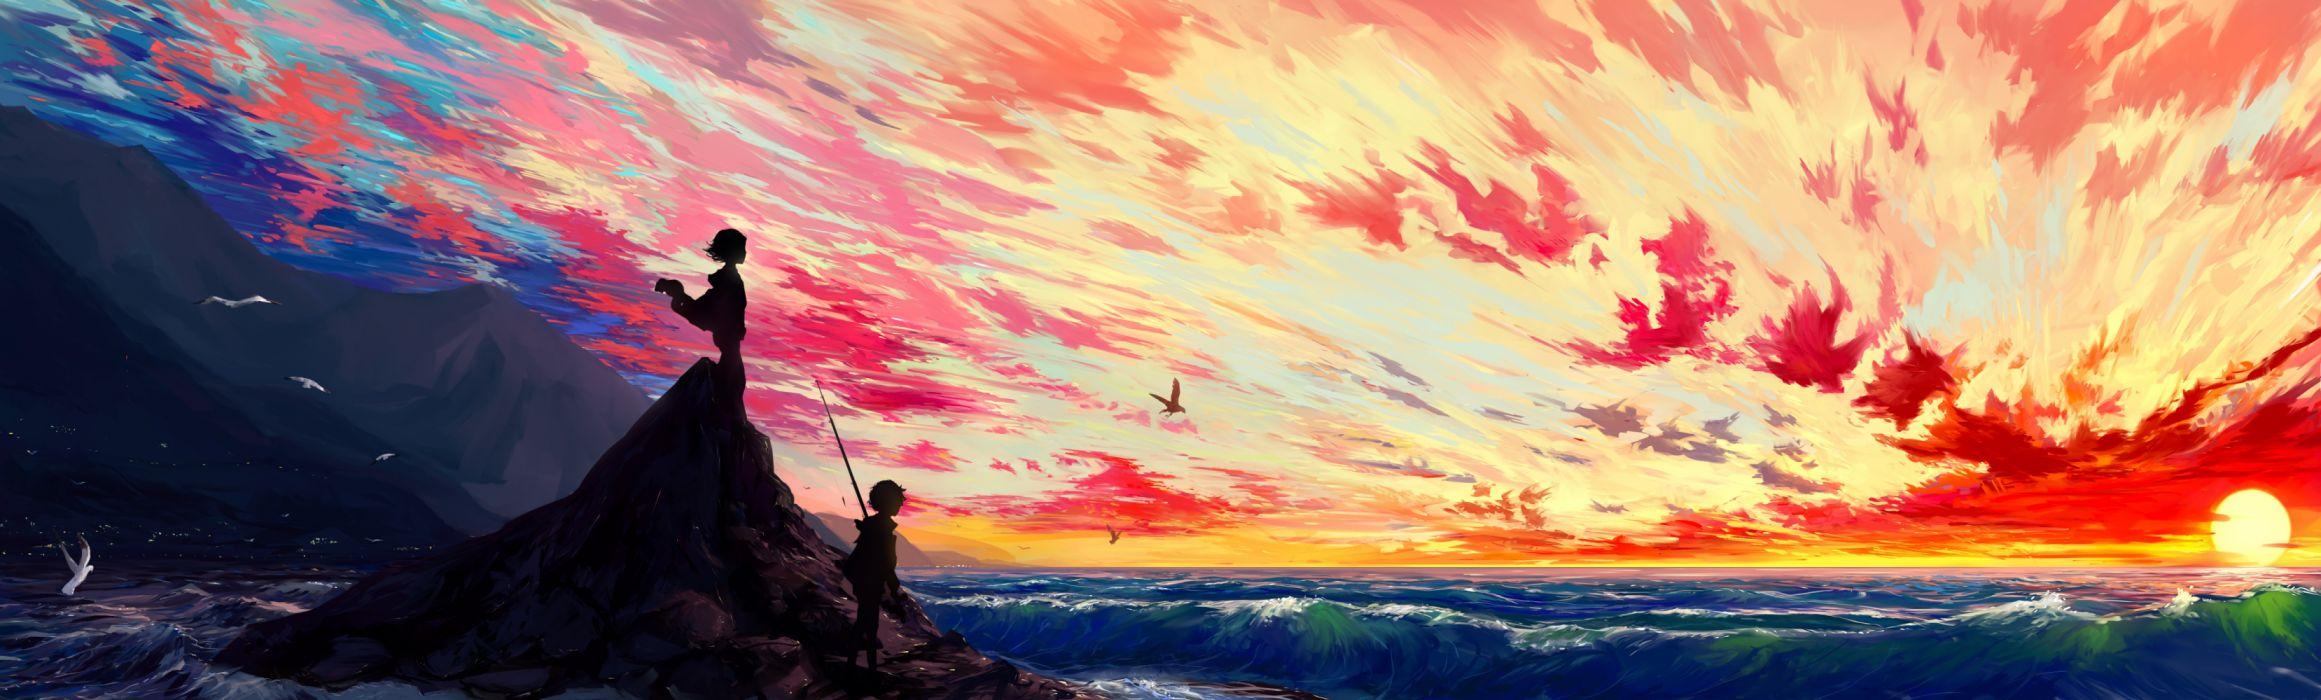 amazing Anime Anime Art wallpaper